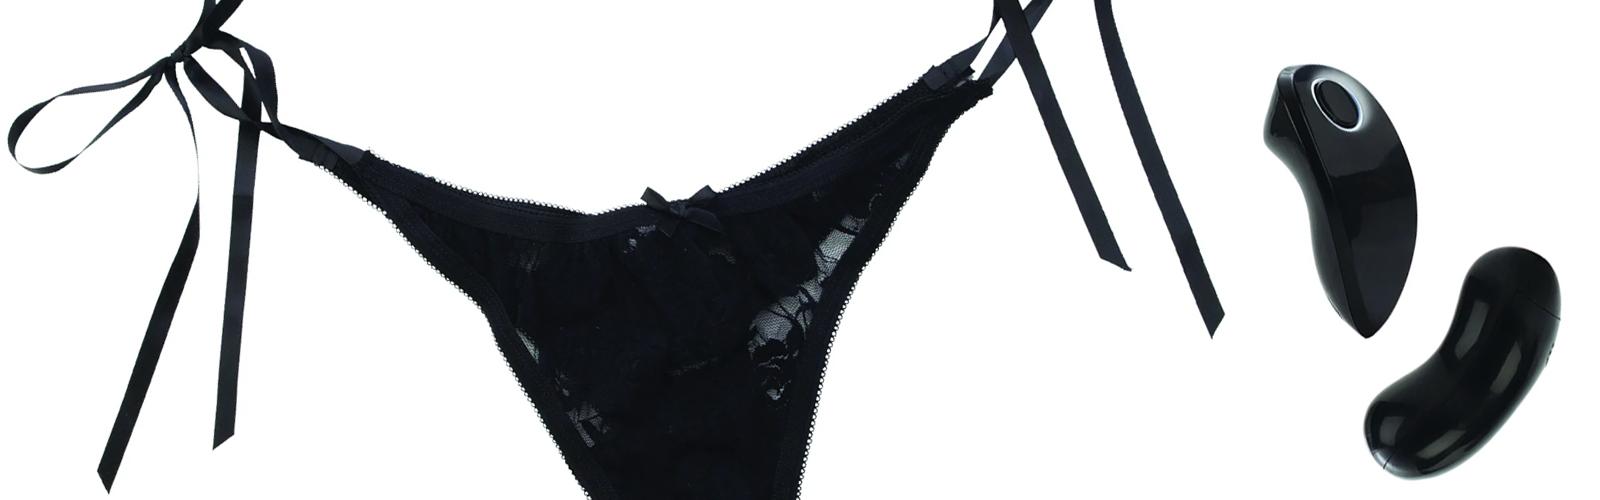 California Exotic Vibrating Panties with Remote